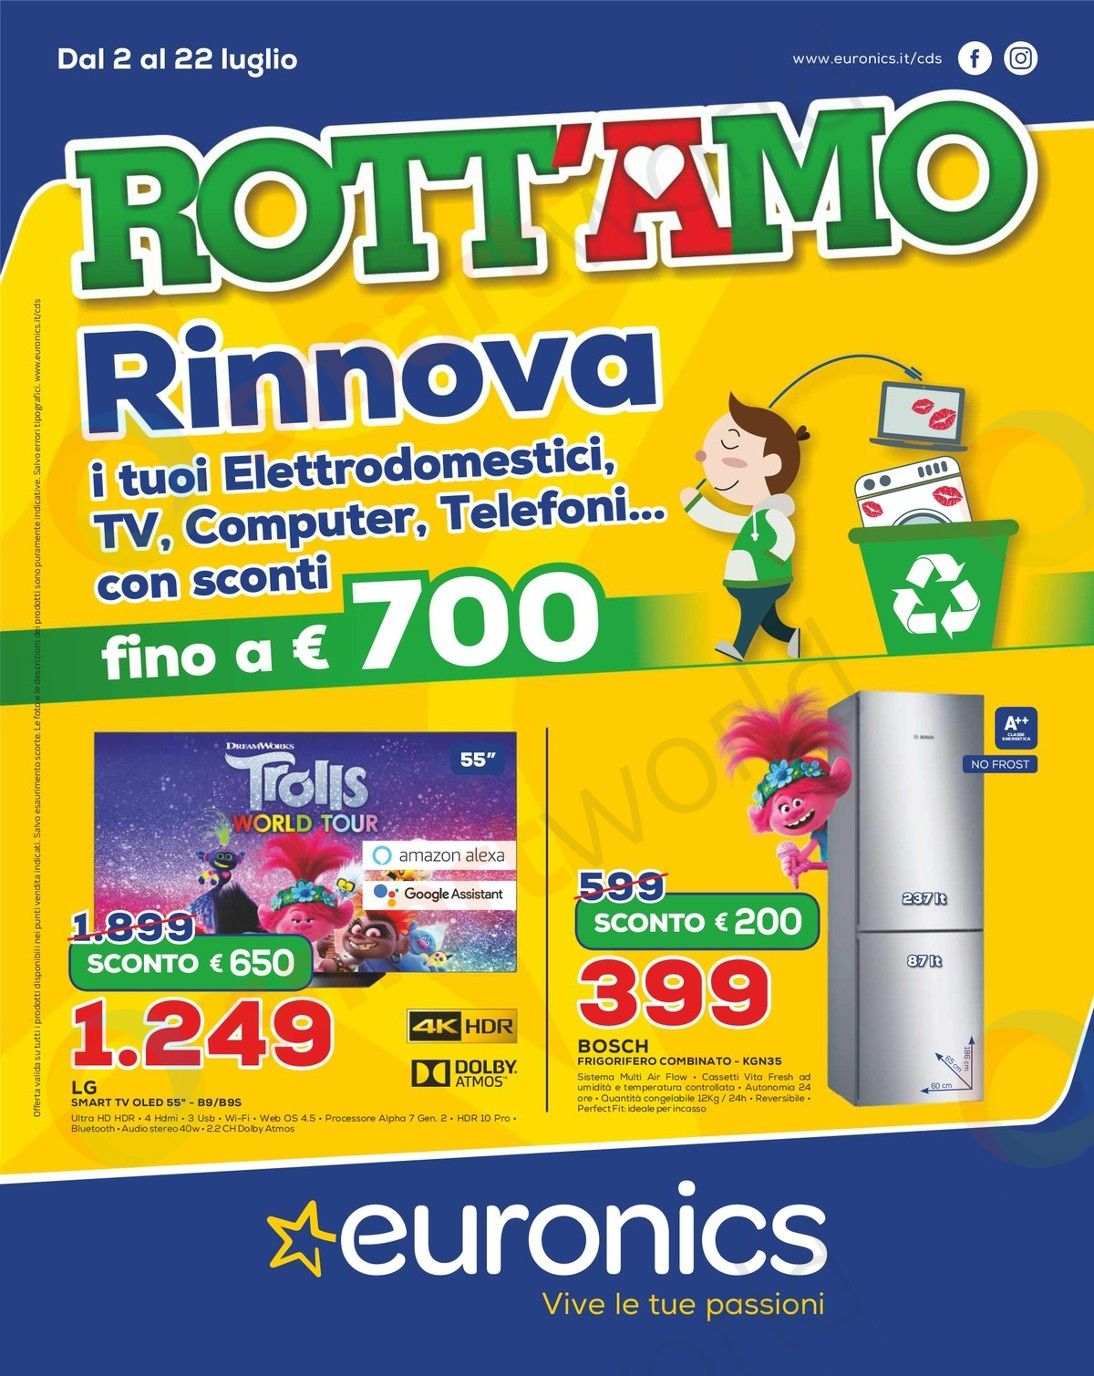 Volantino Euronics Rott'Amo – CDS (1)